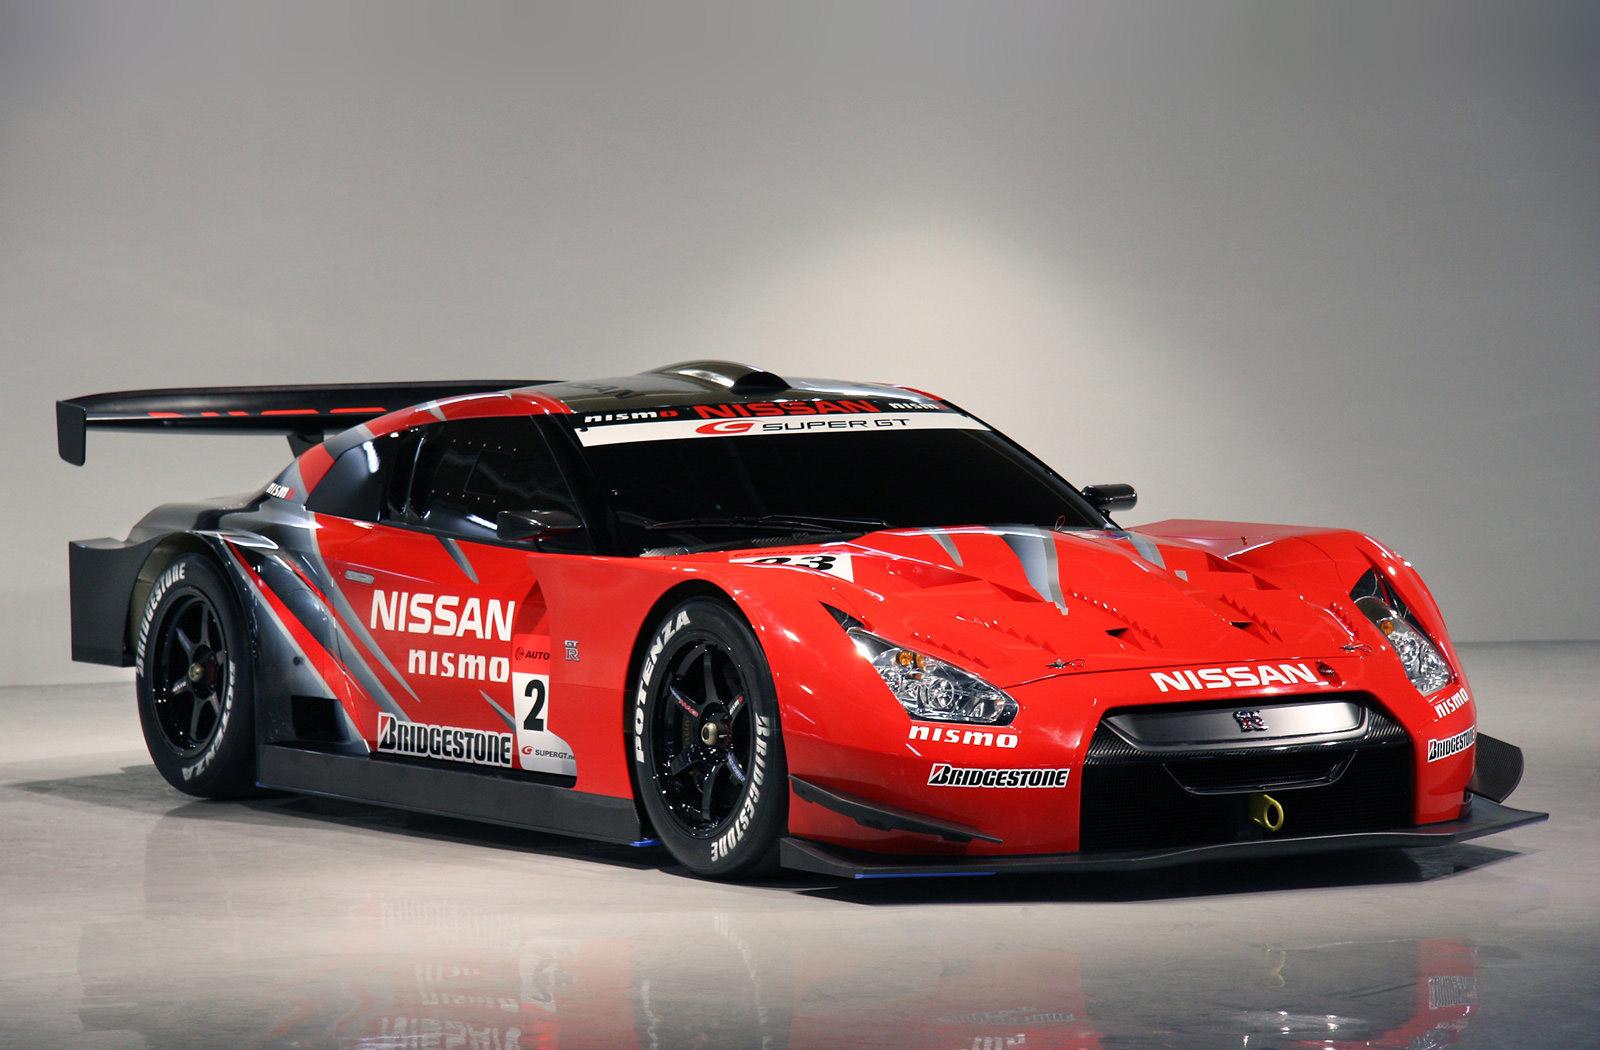 Nissan GT-R GT500 In Full Race Livery